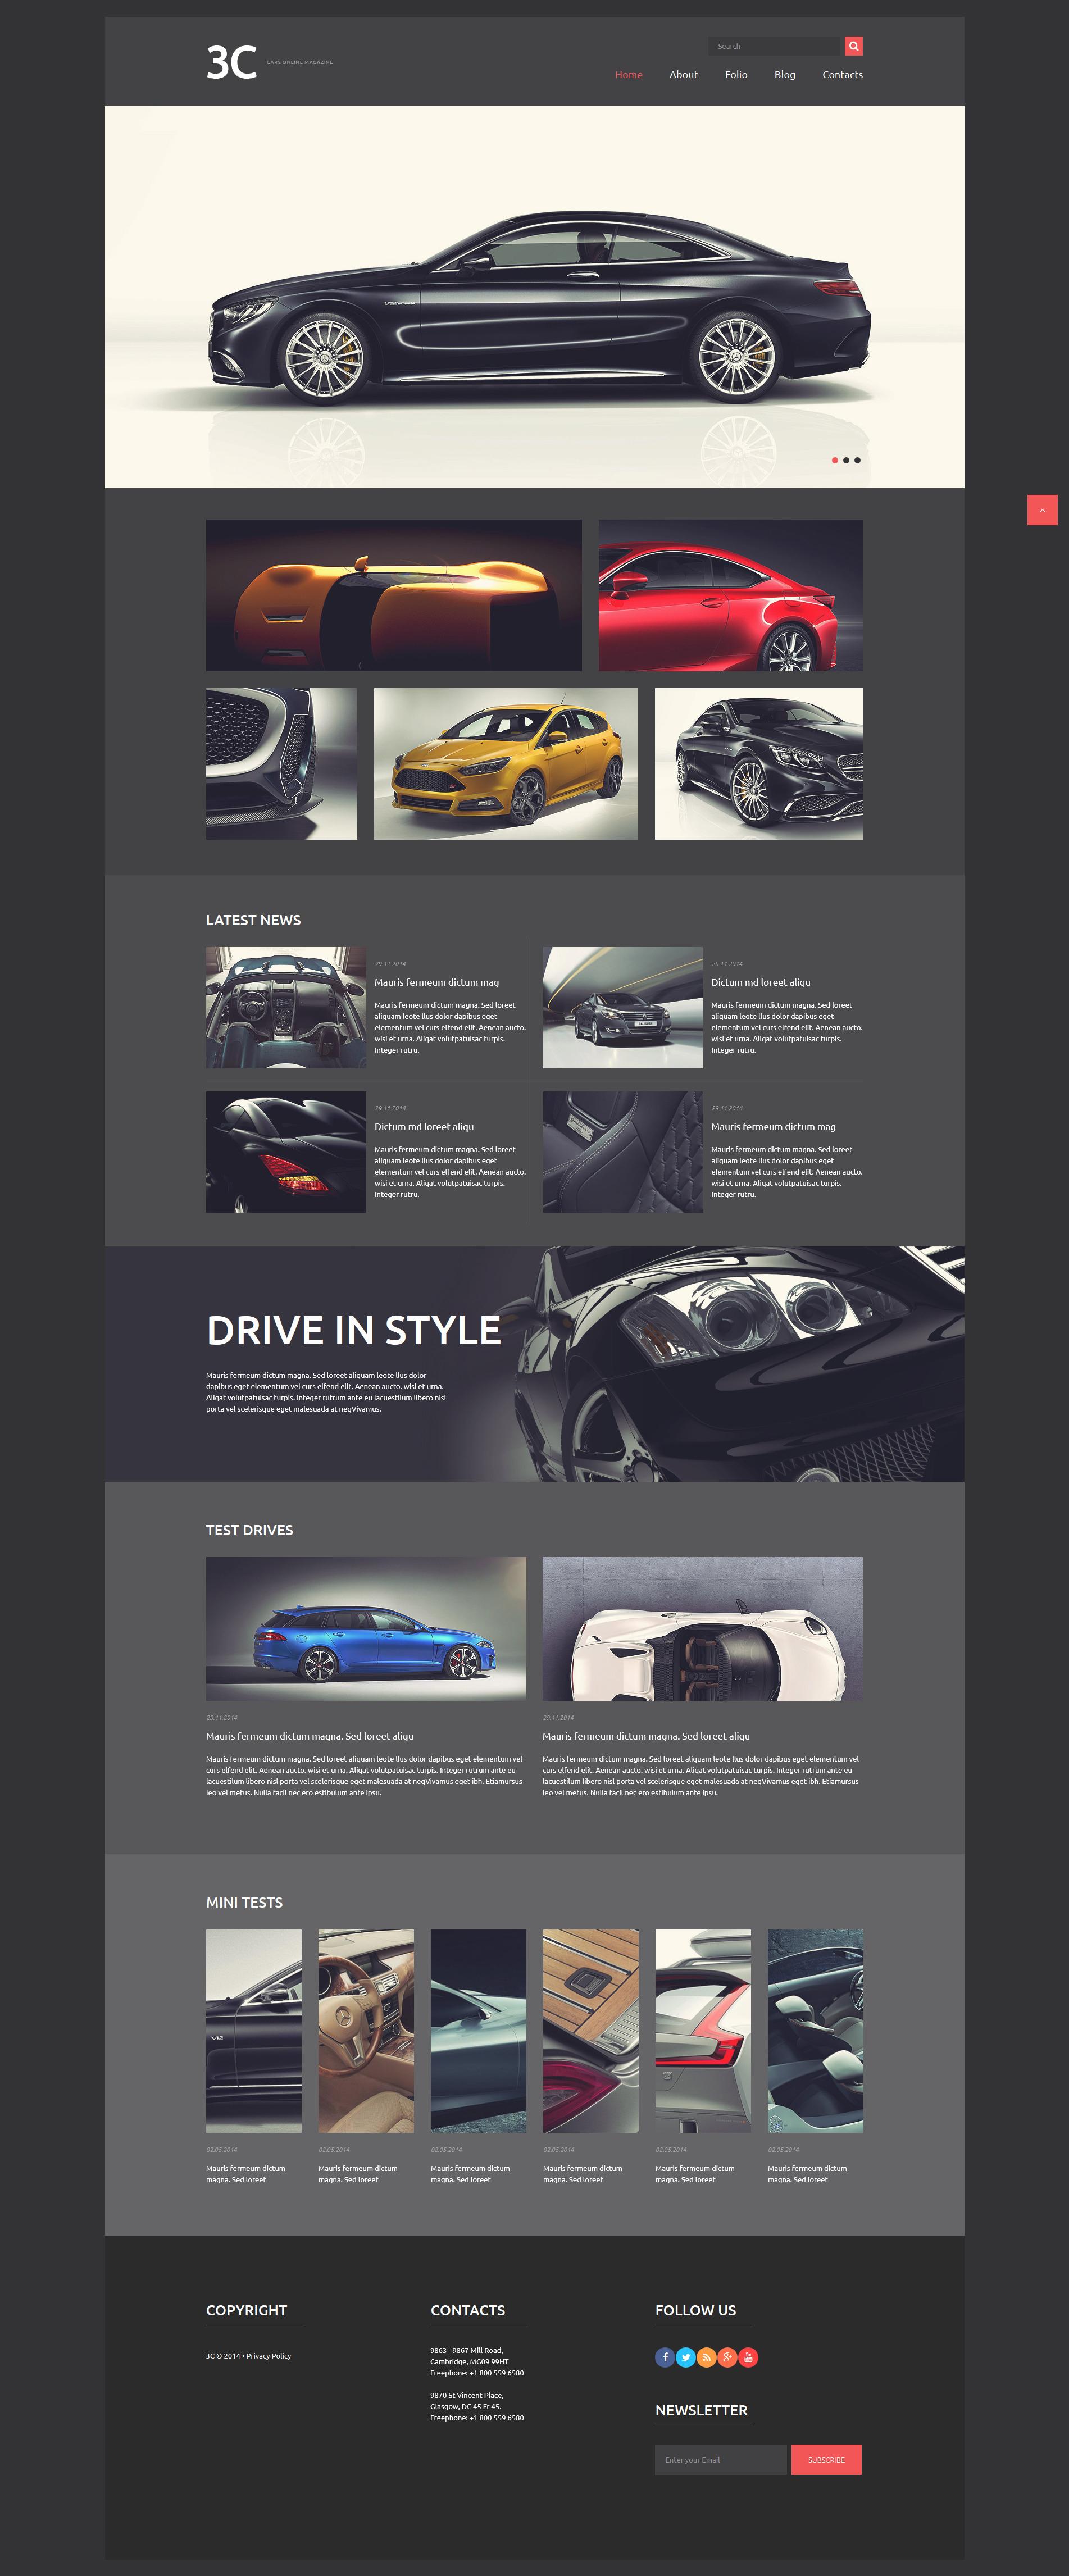 Auto Enthusiasts Club Joomla Template